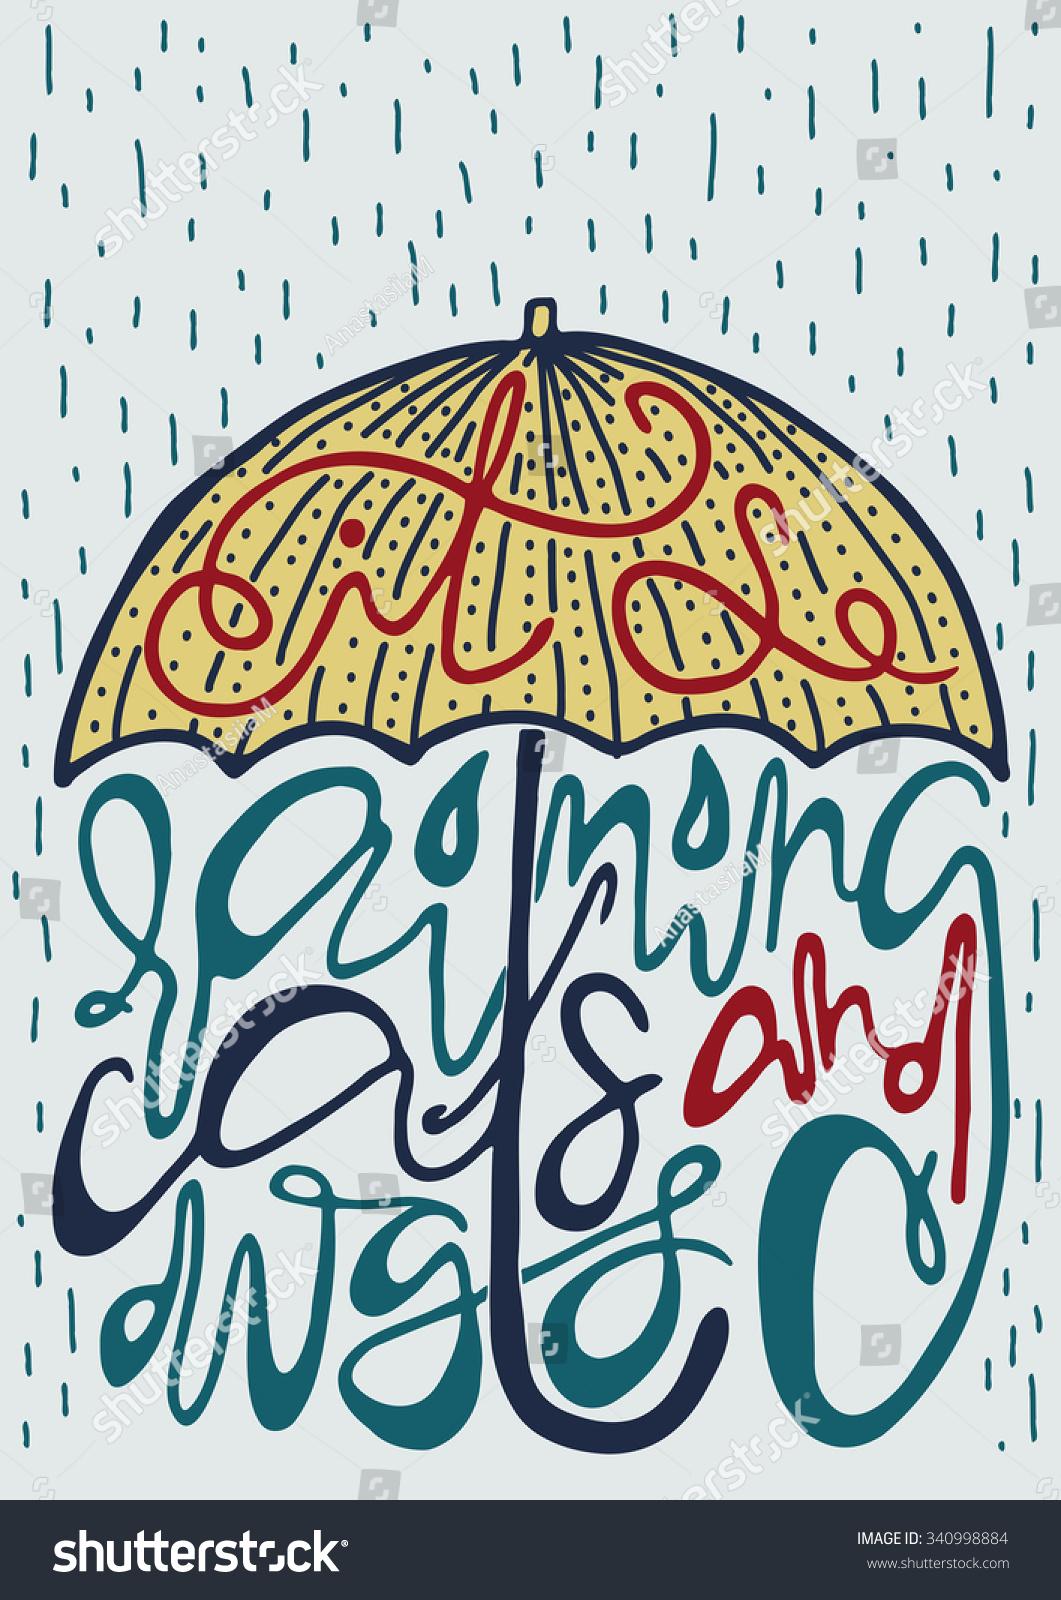 Bright Poster Silhouette Umbrella English Idiomatic Stock Vector Royalty Free 340998884